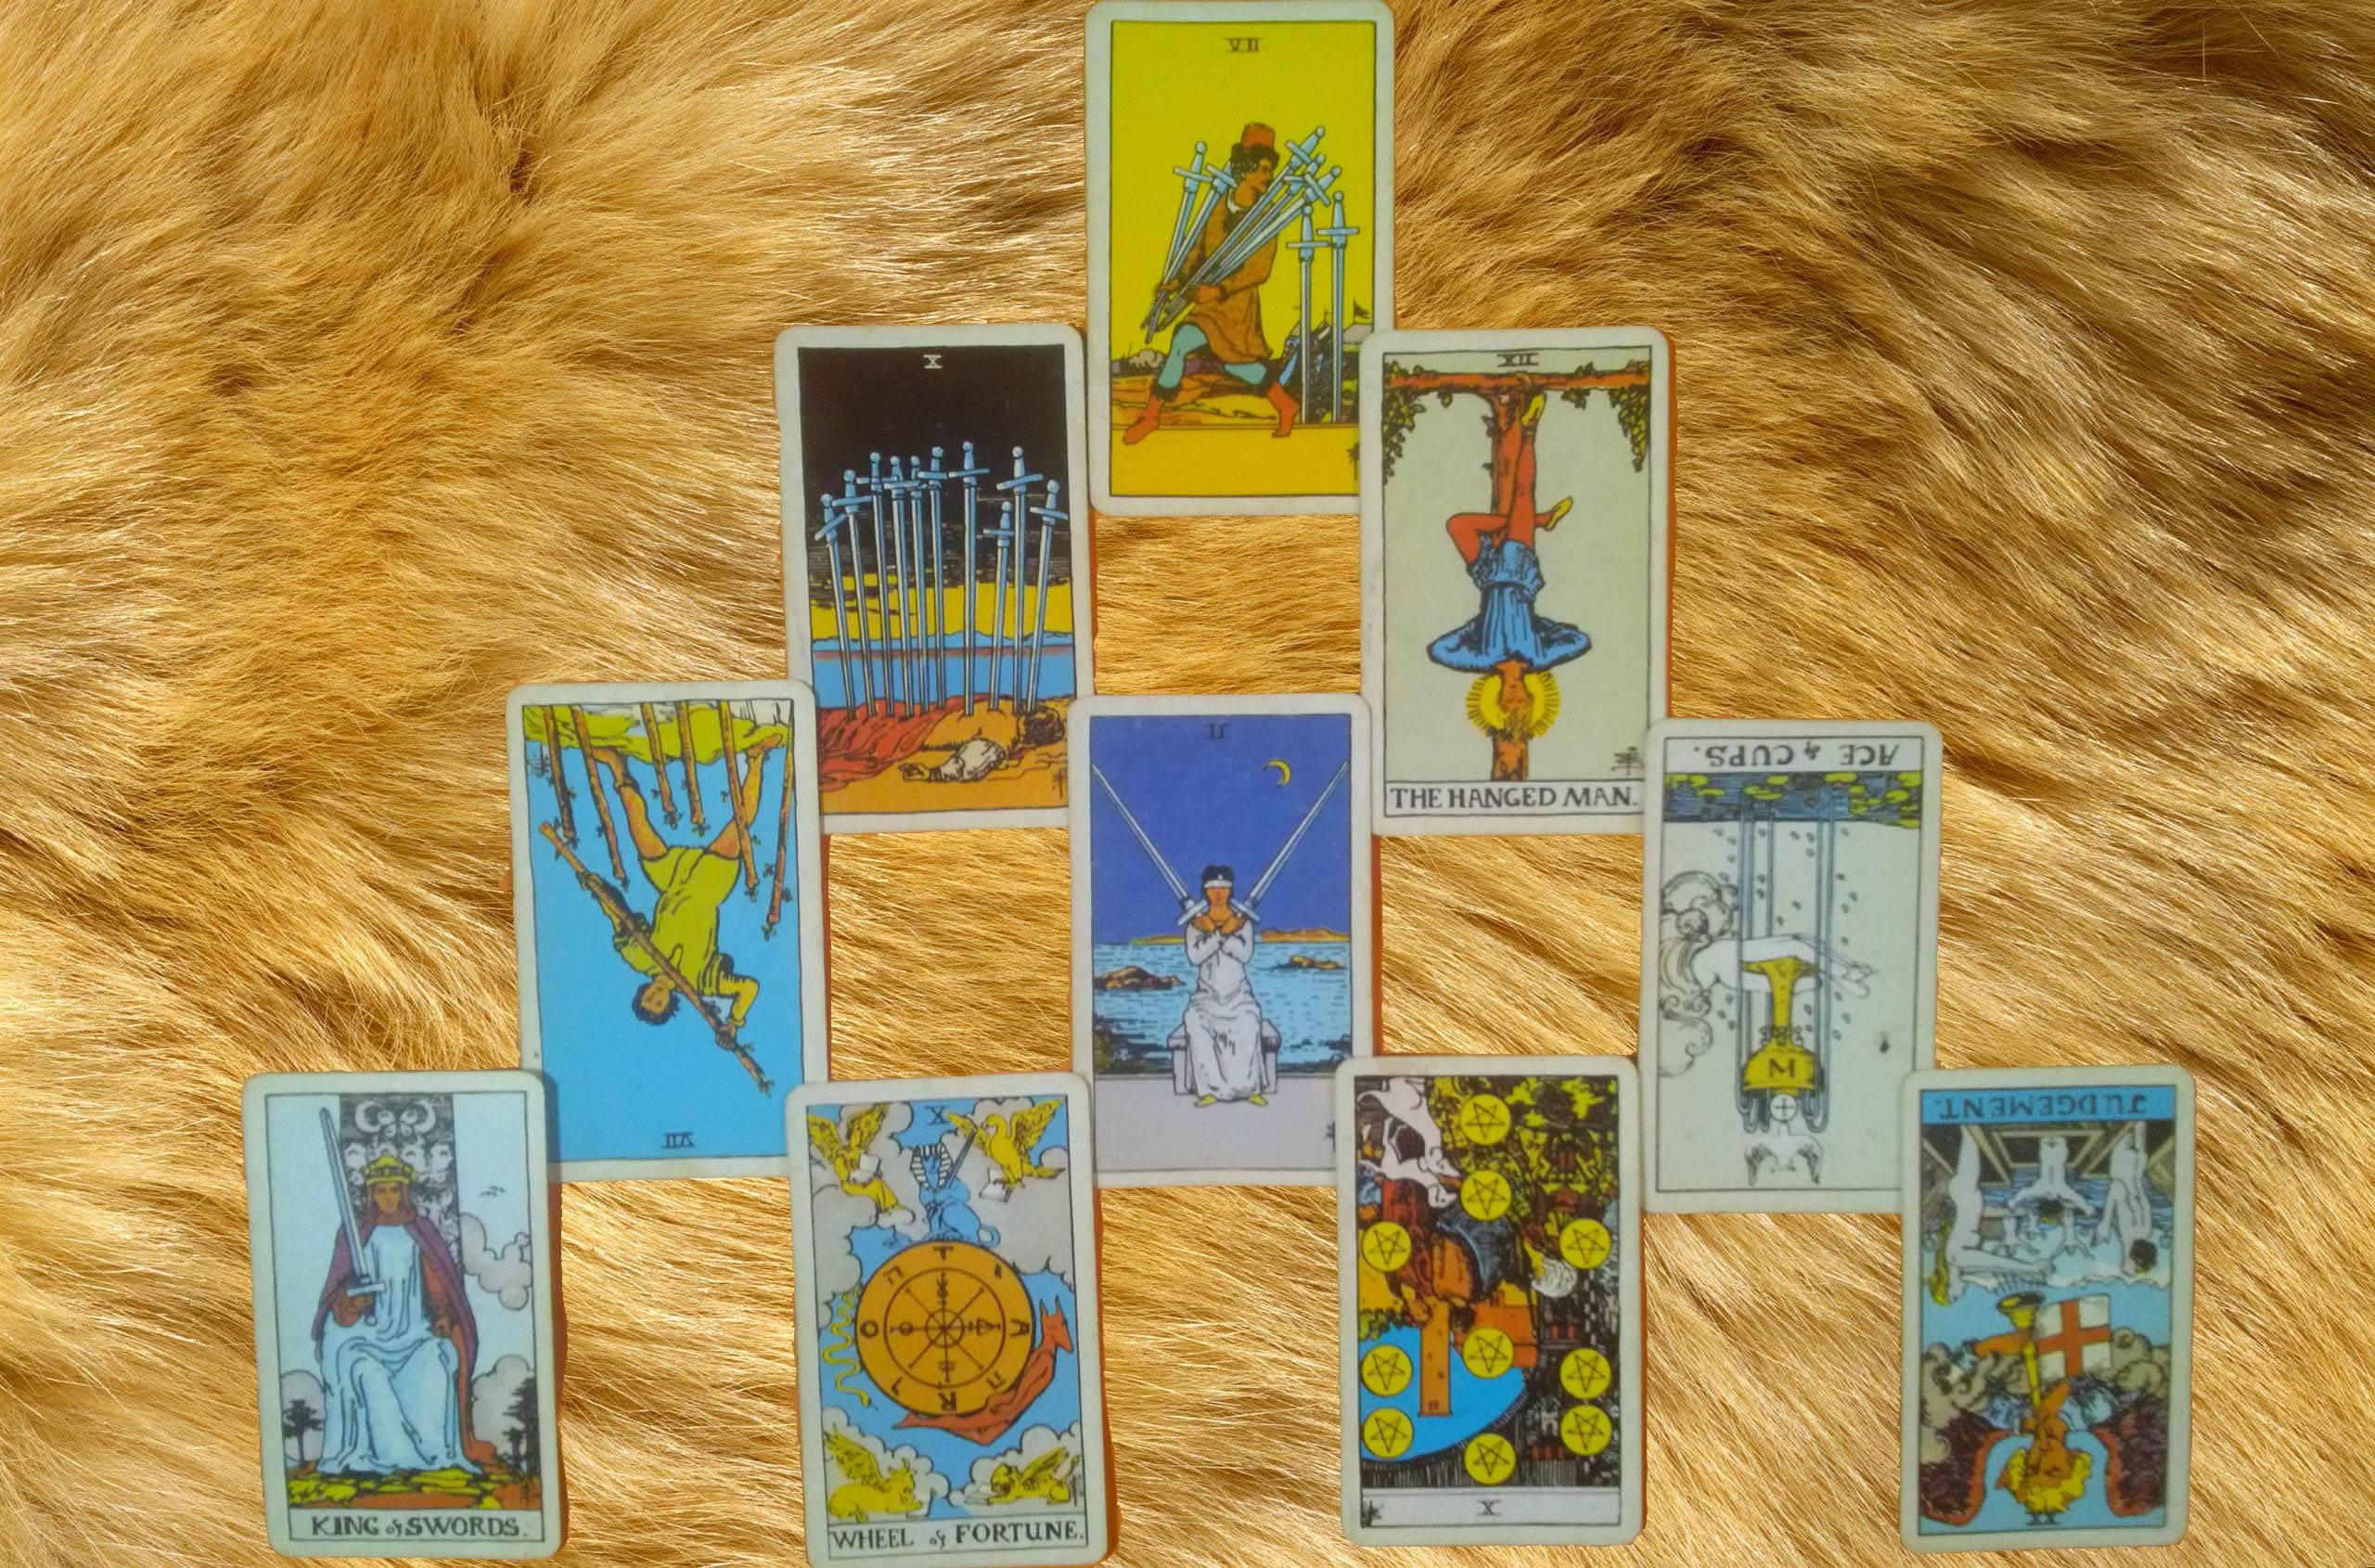 Таро тота алистера кроули — значение карт